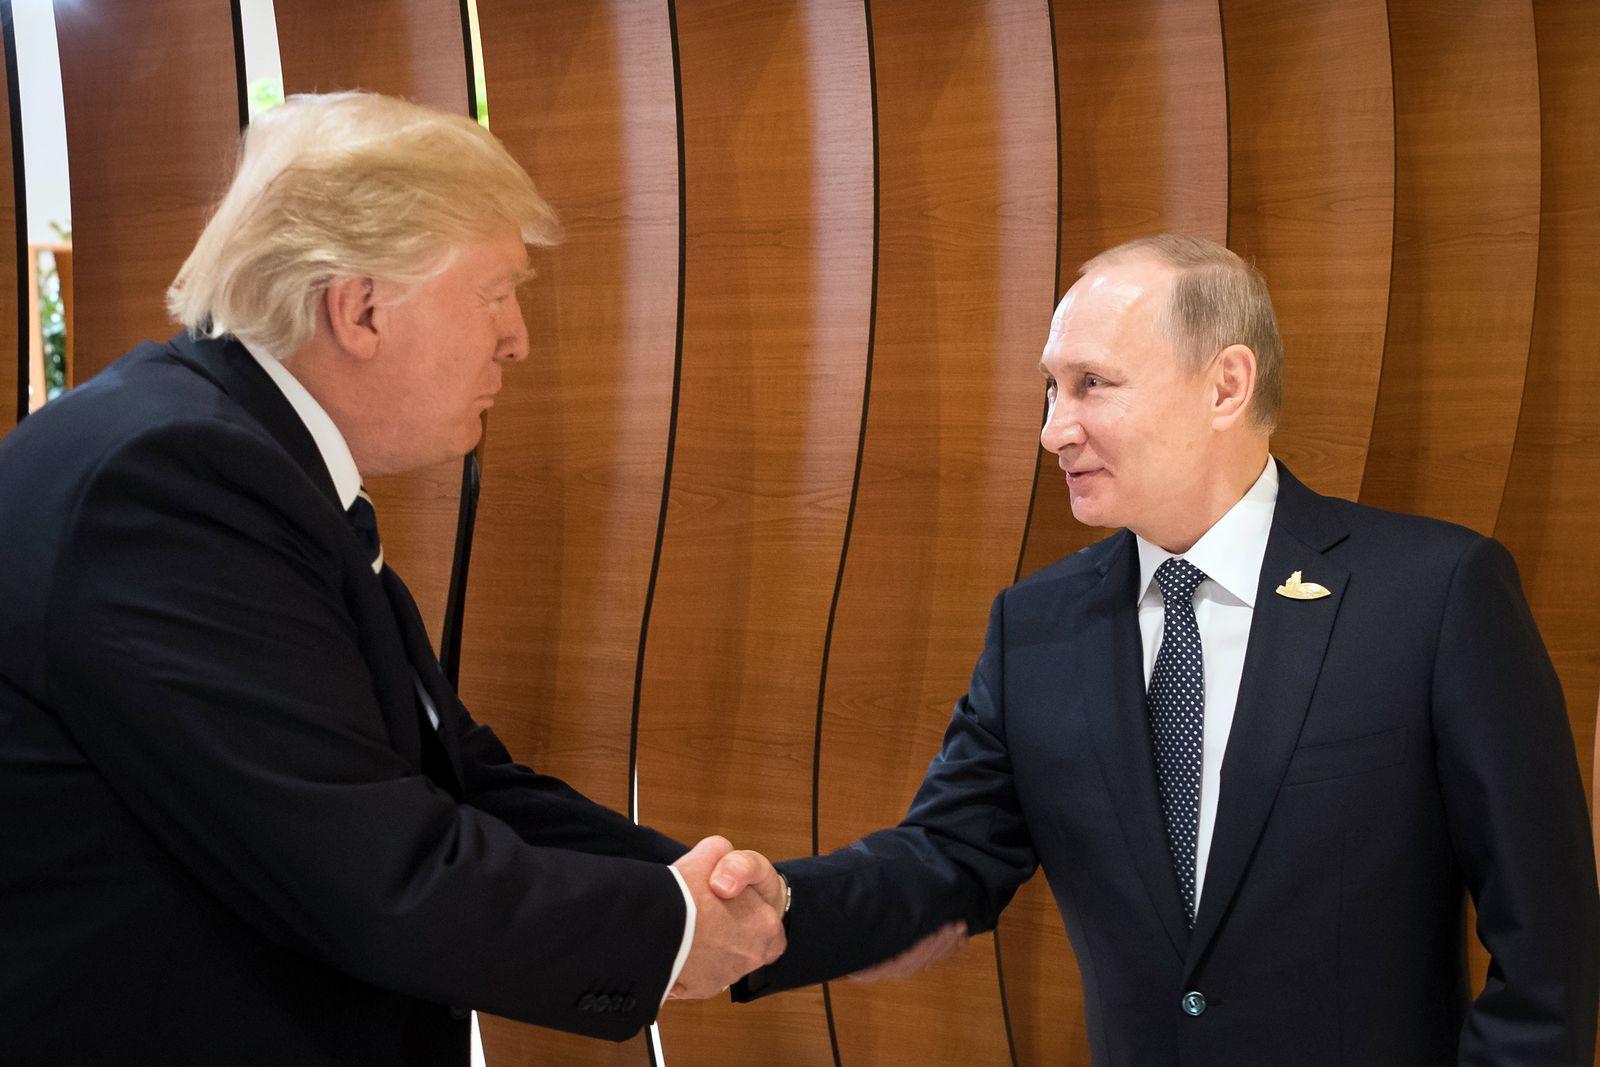 Trump/ Putin/ Helsinki/ Handshake